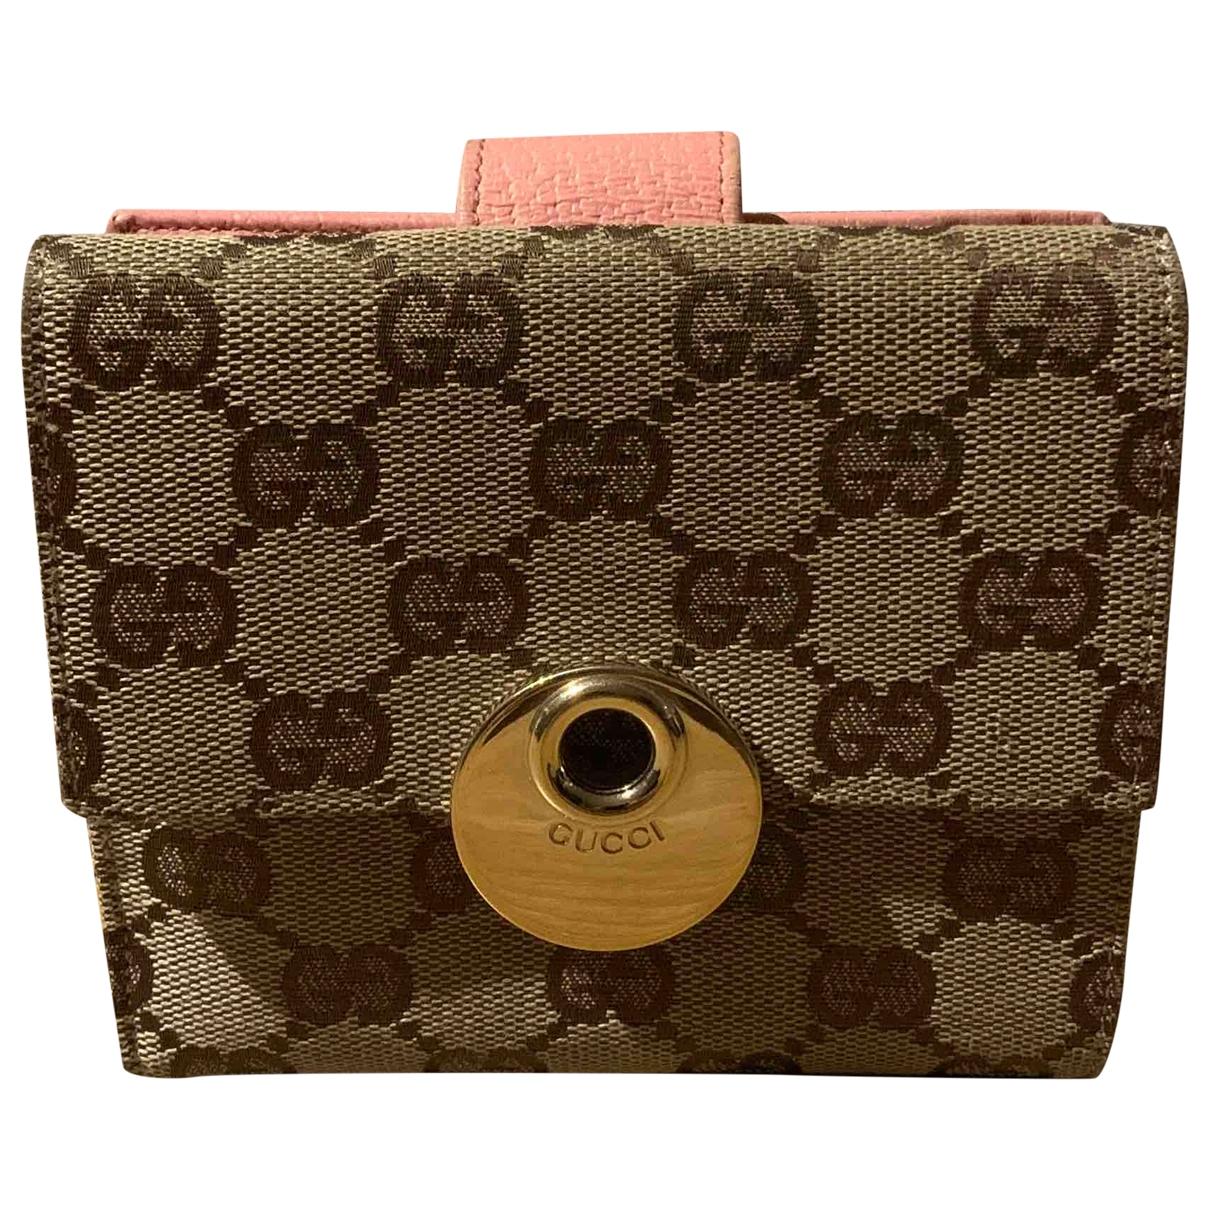 Gucci \N Multicolour wallet for Women \N